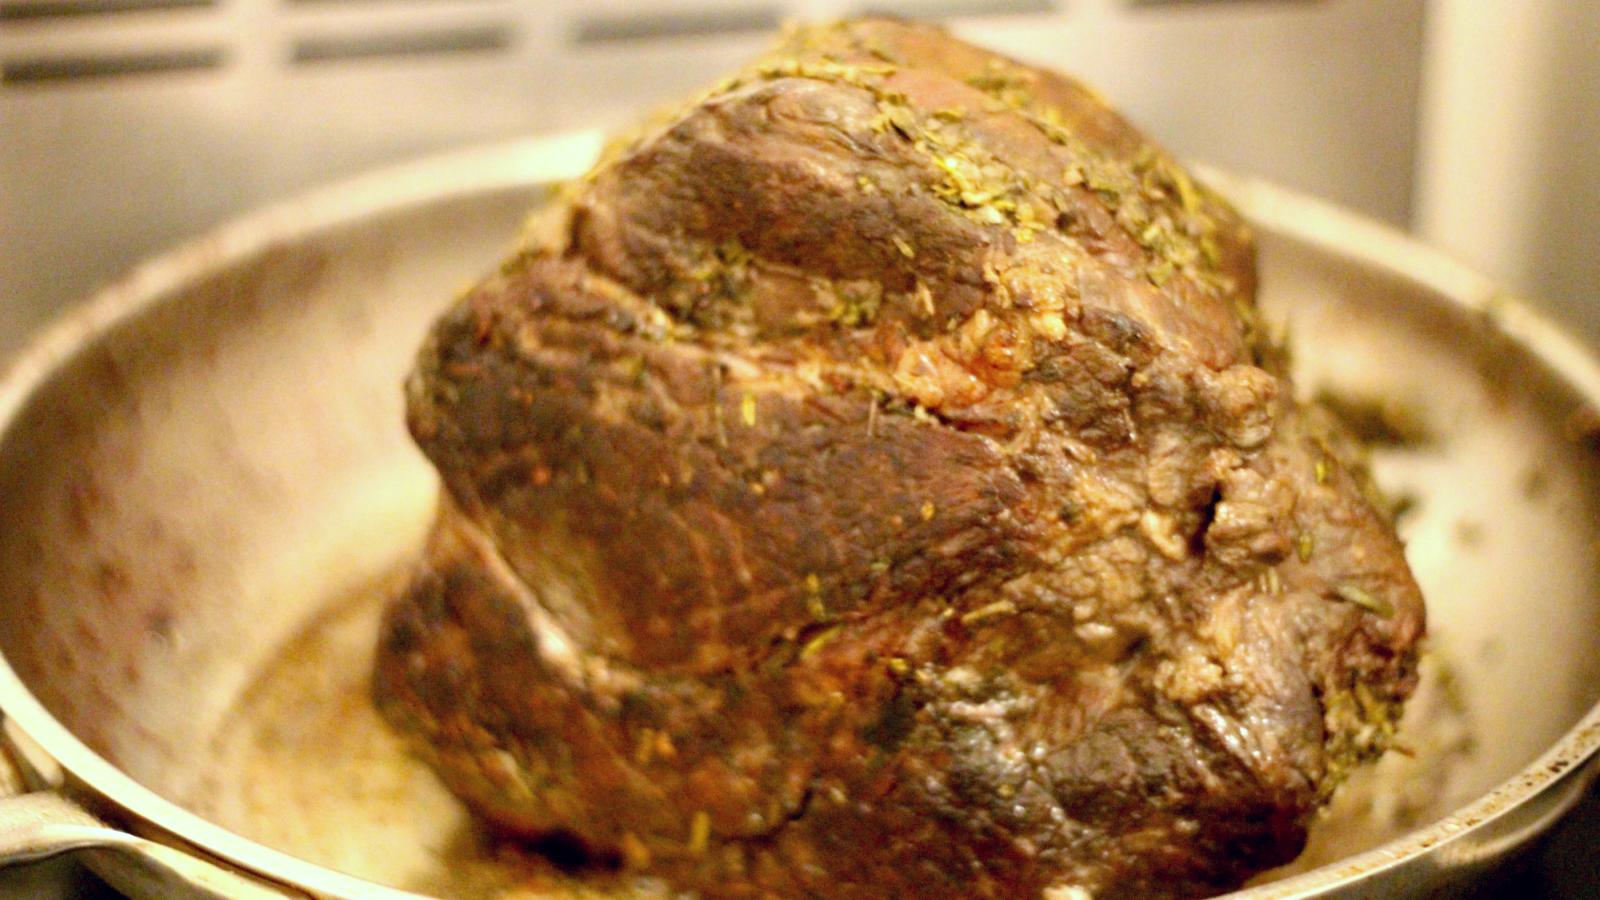 How To Make Chuck Steak Taste Like Prime Rib